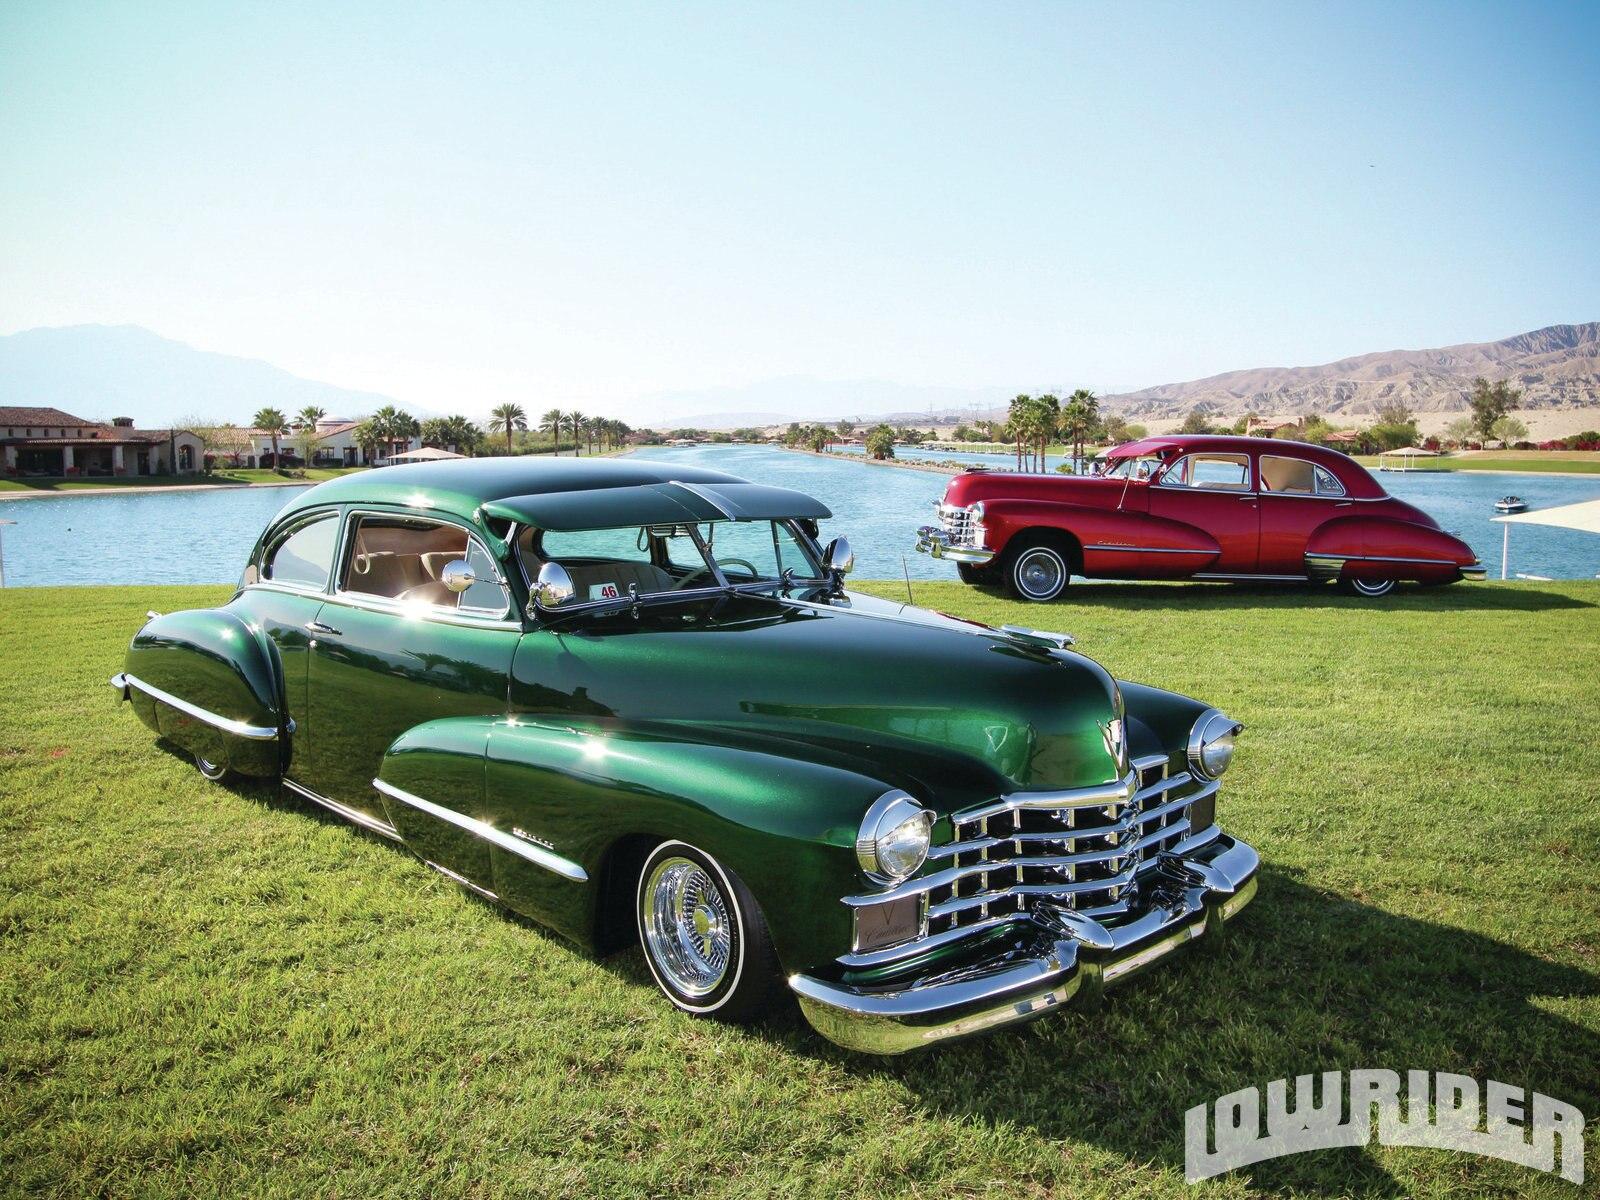 1946 Cadillac Club Coupe 62 Series And 1947 Cadillac Sedan